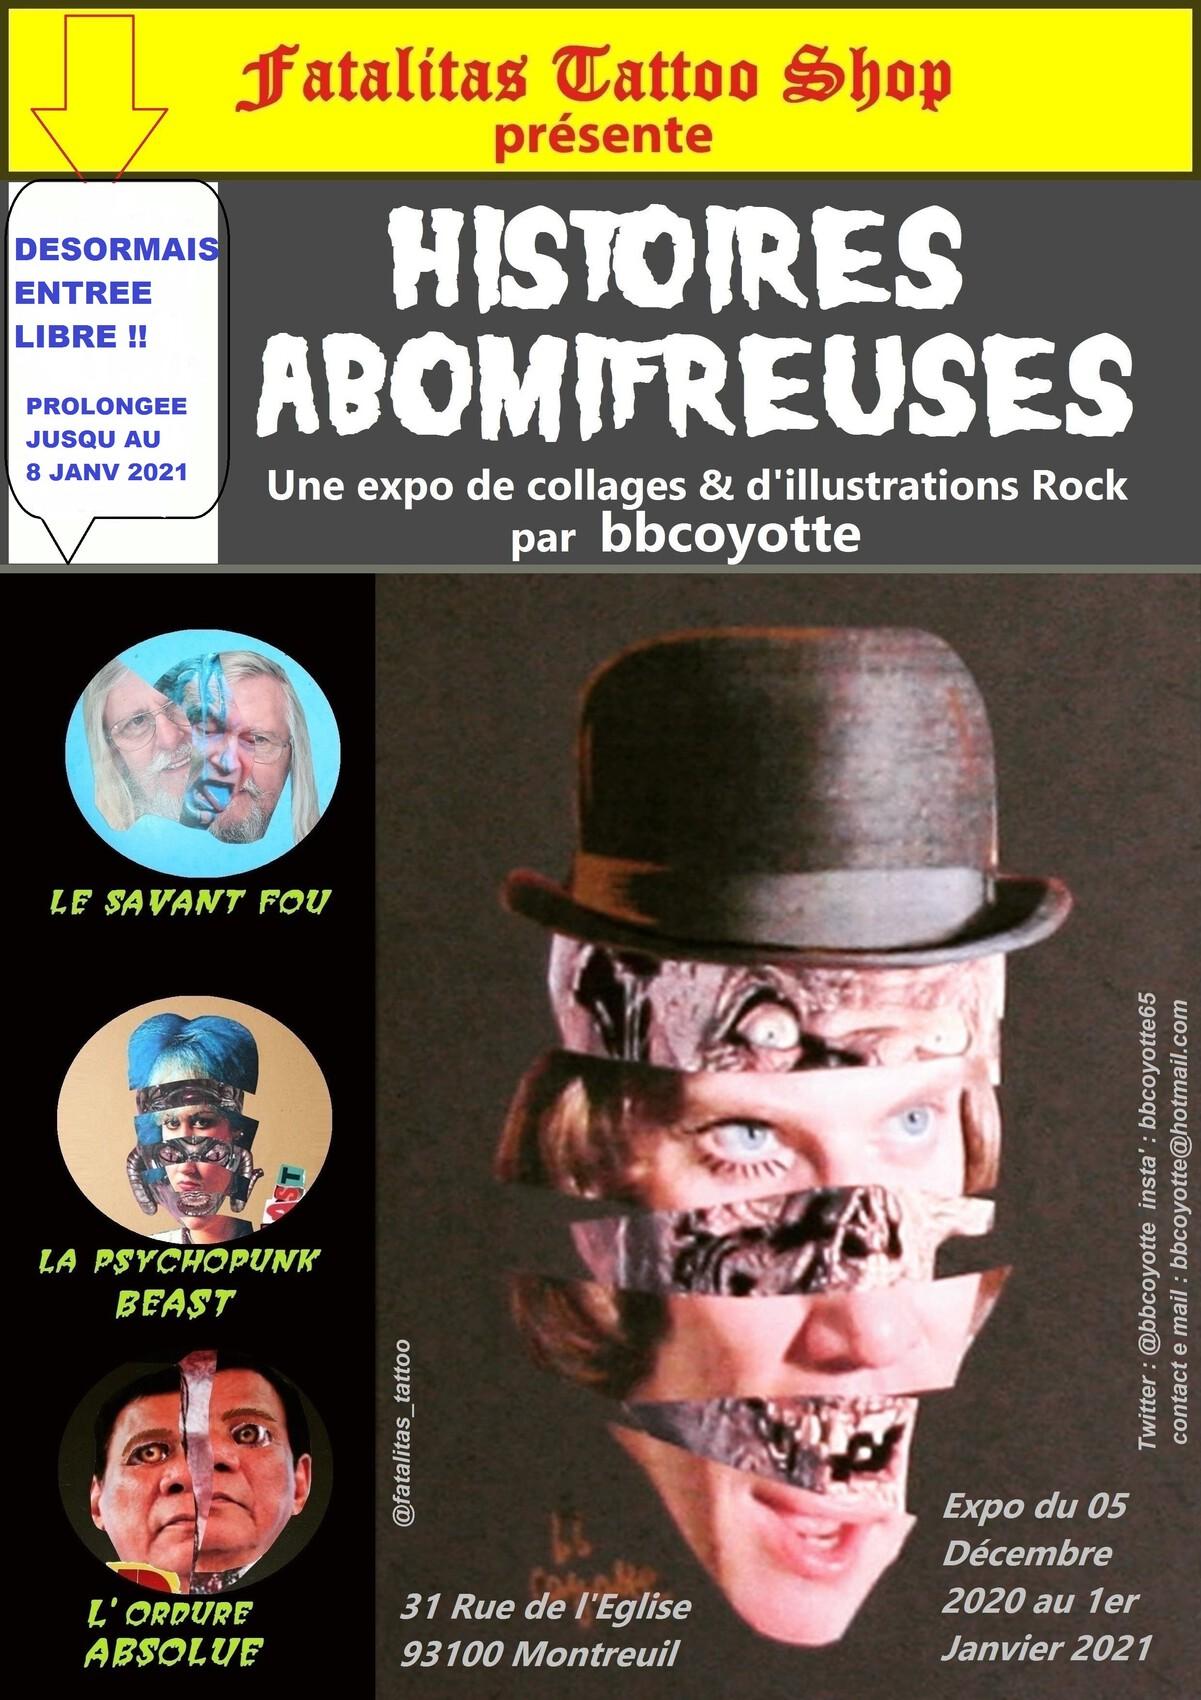 Histoires Abomifreuses / collages expo2020 par bbcoyotte